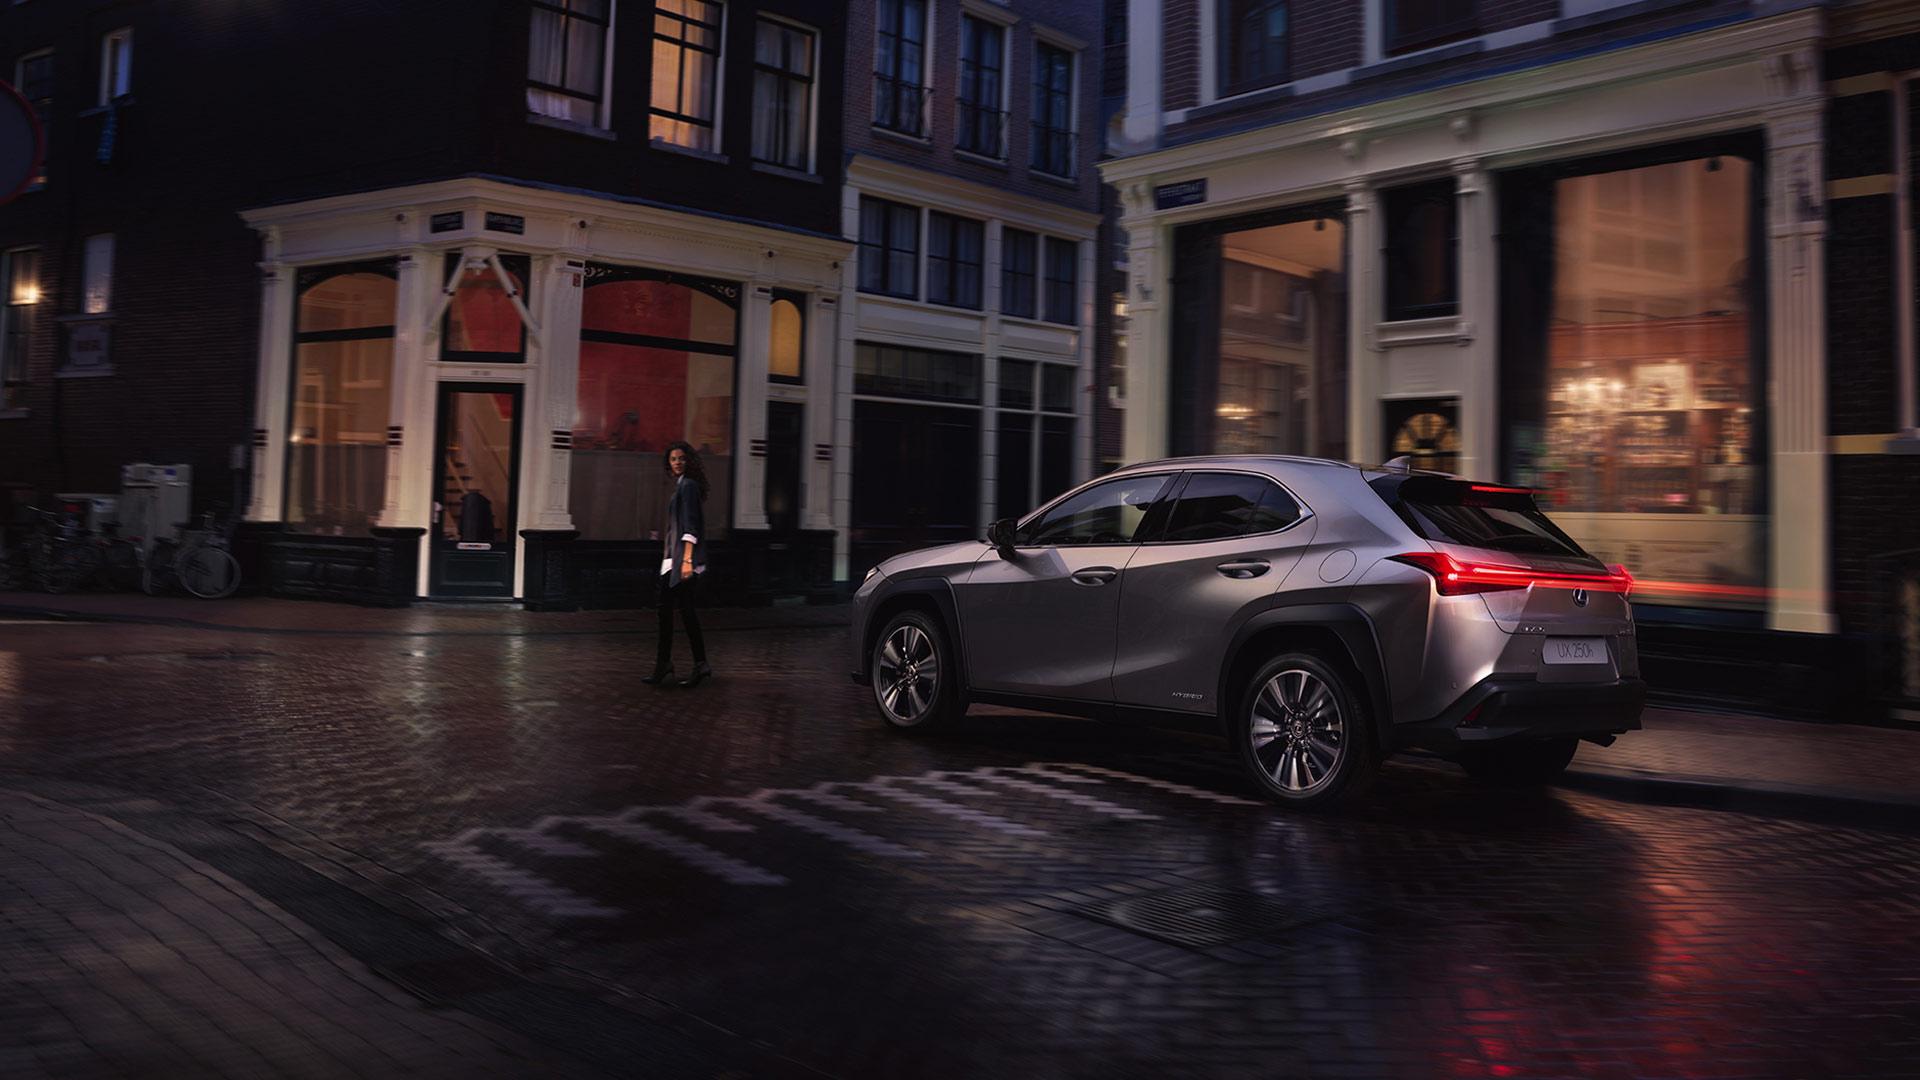 Lexus Rent Per Drive 1920x1080 image